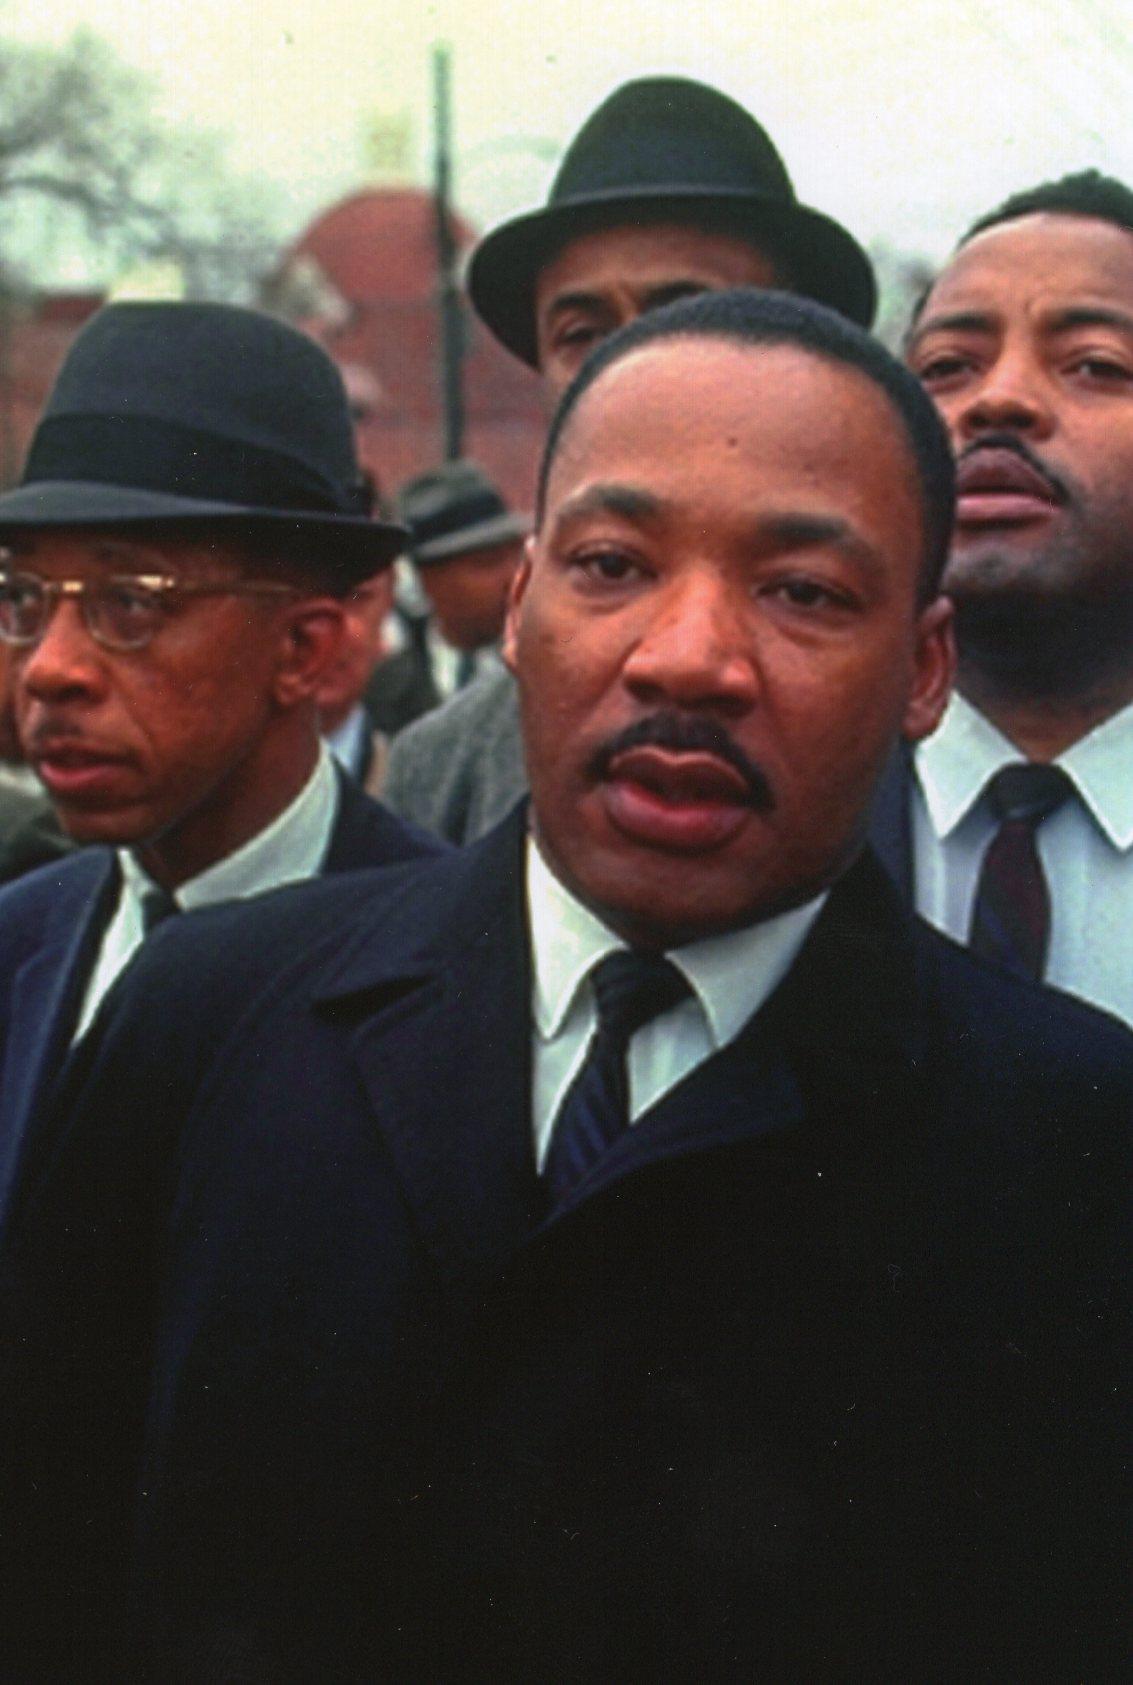 Martin Luther King Jr. on Pettus Bridge Selma-Montgomery Civil Rights March March 21, 1965